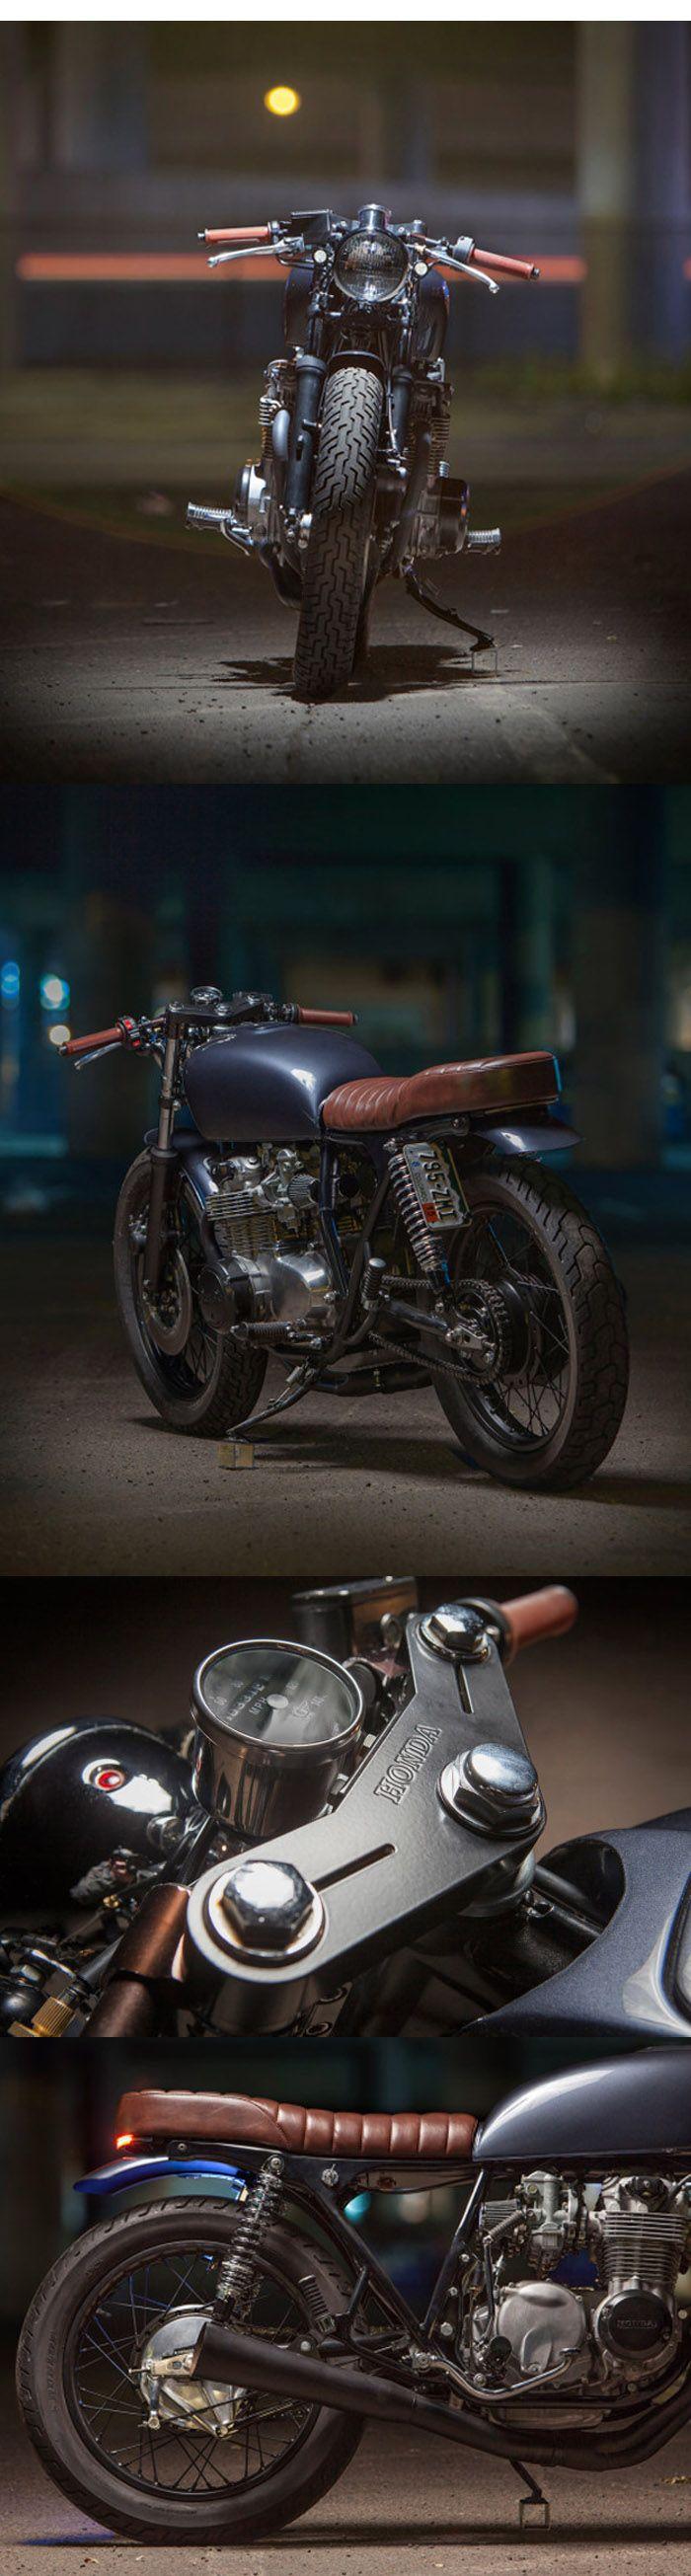 Backyard build: Dave Lehl's Honda CB550     http://motofanatics.blogspot.co.uk/2014/11/backyard-build-dave-lehls-honda-cb550.html